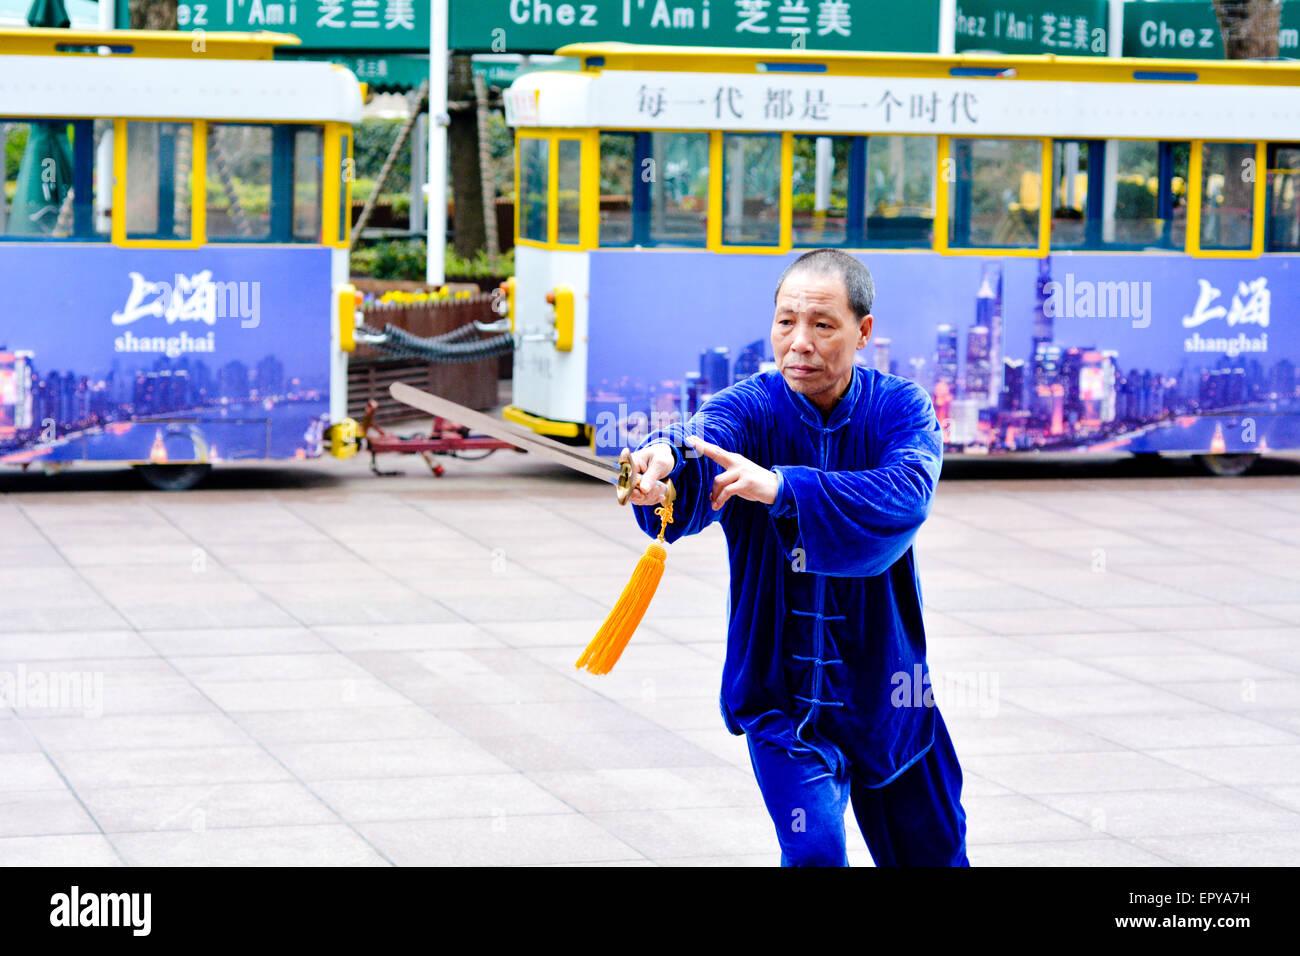 SHANGHAI, CN - MAR 17 2015:Chinese man practice Tai Chi in Nanjing Road Shanghai China.It is an internal Chinese - Stock Image